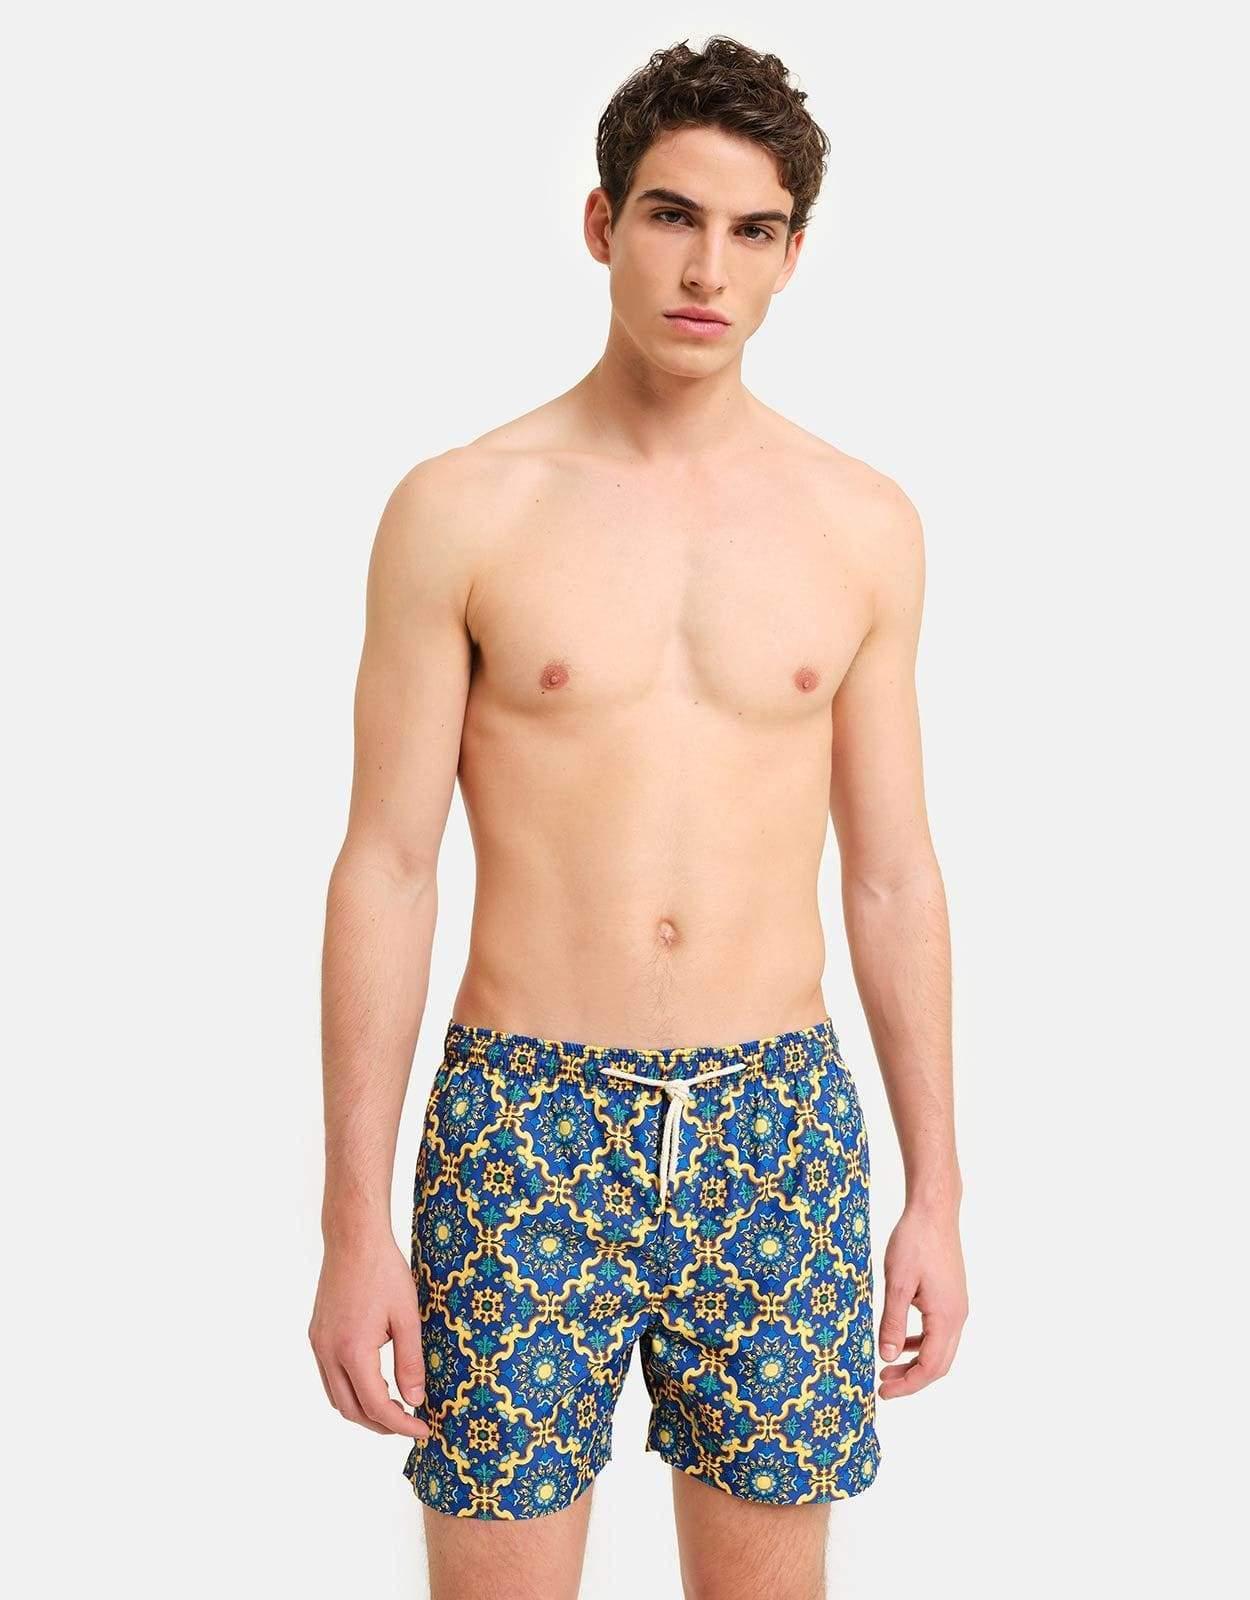 Peninsula Swimwear Clothing RAPALLO MICRO ELASTIC